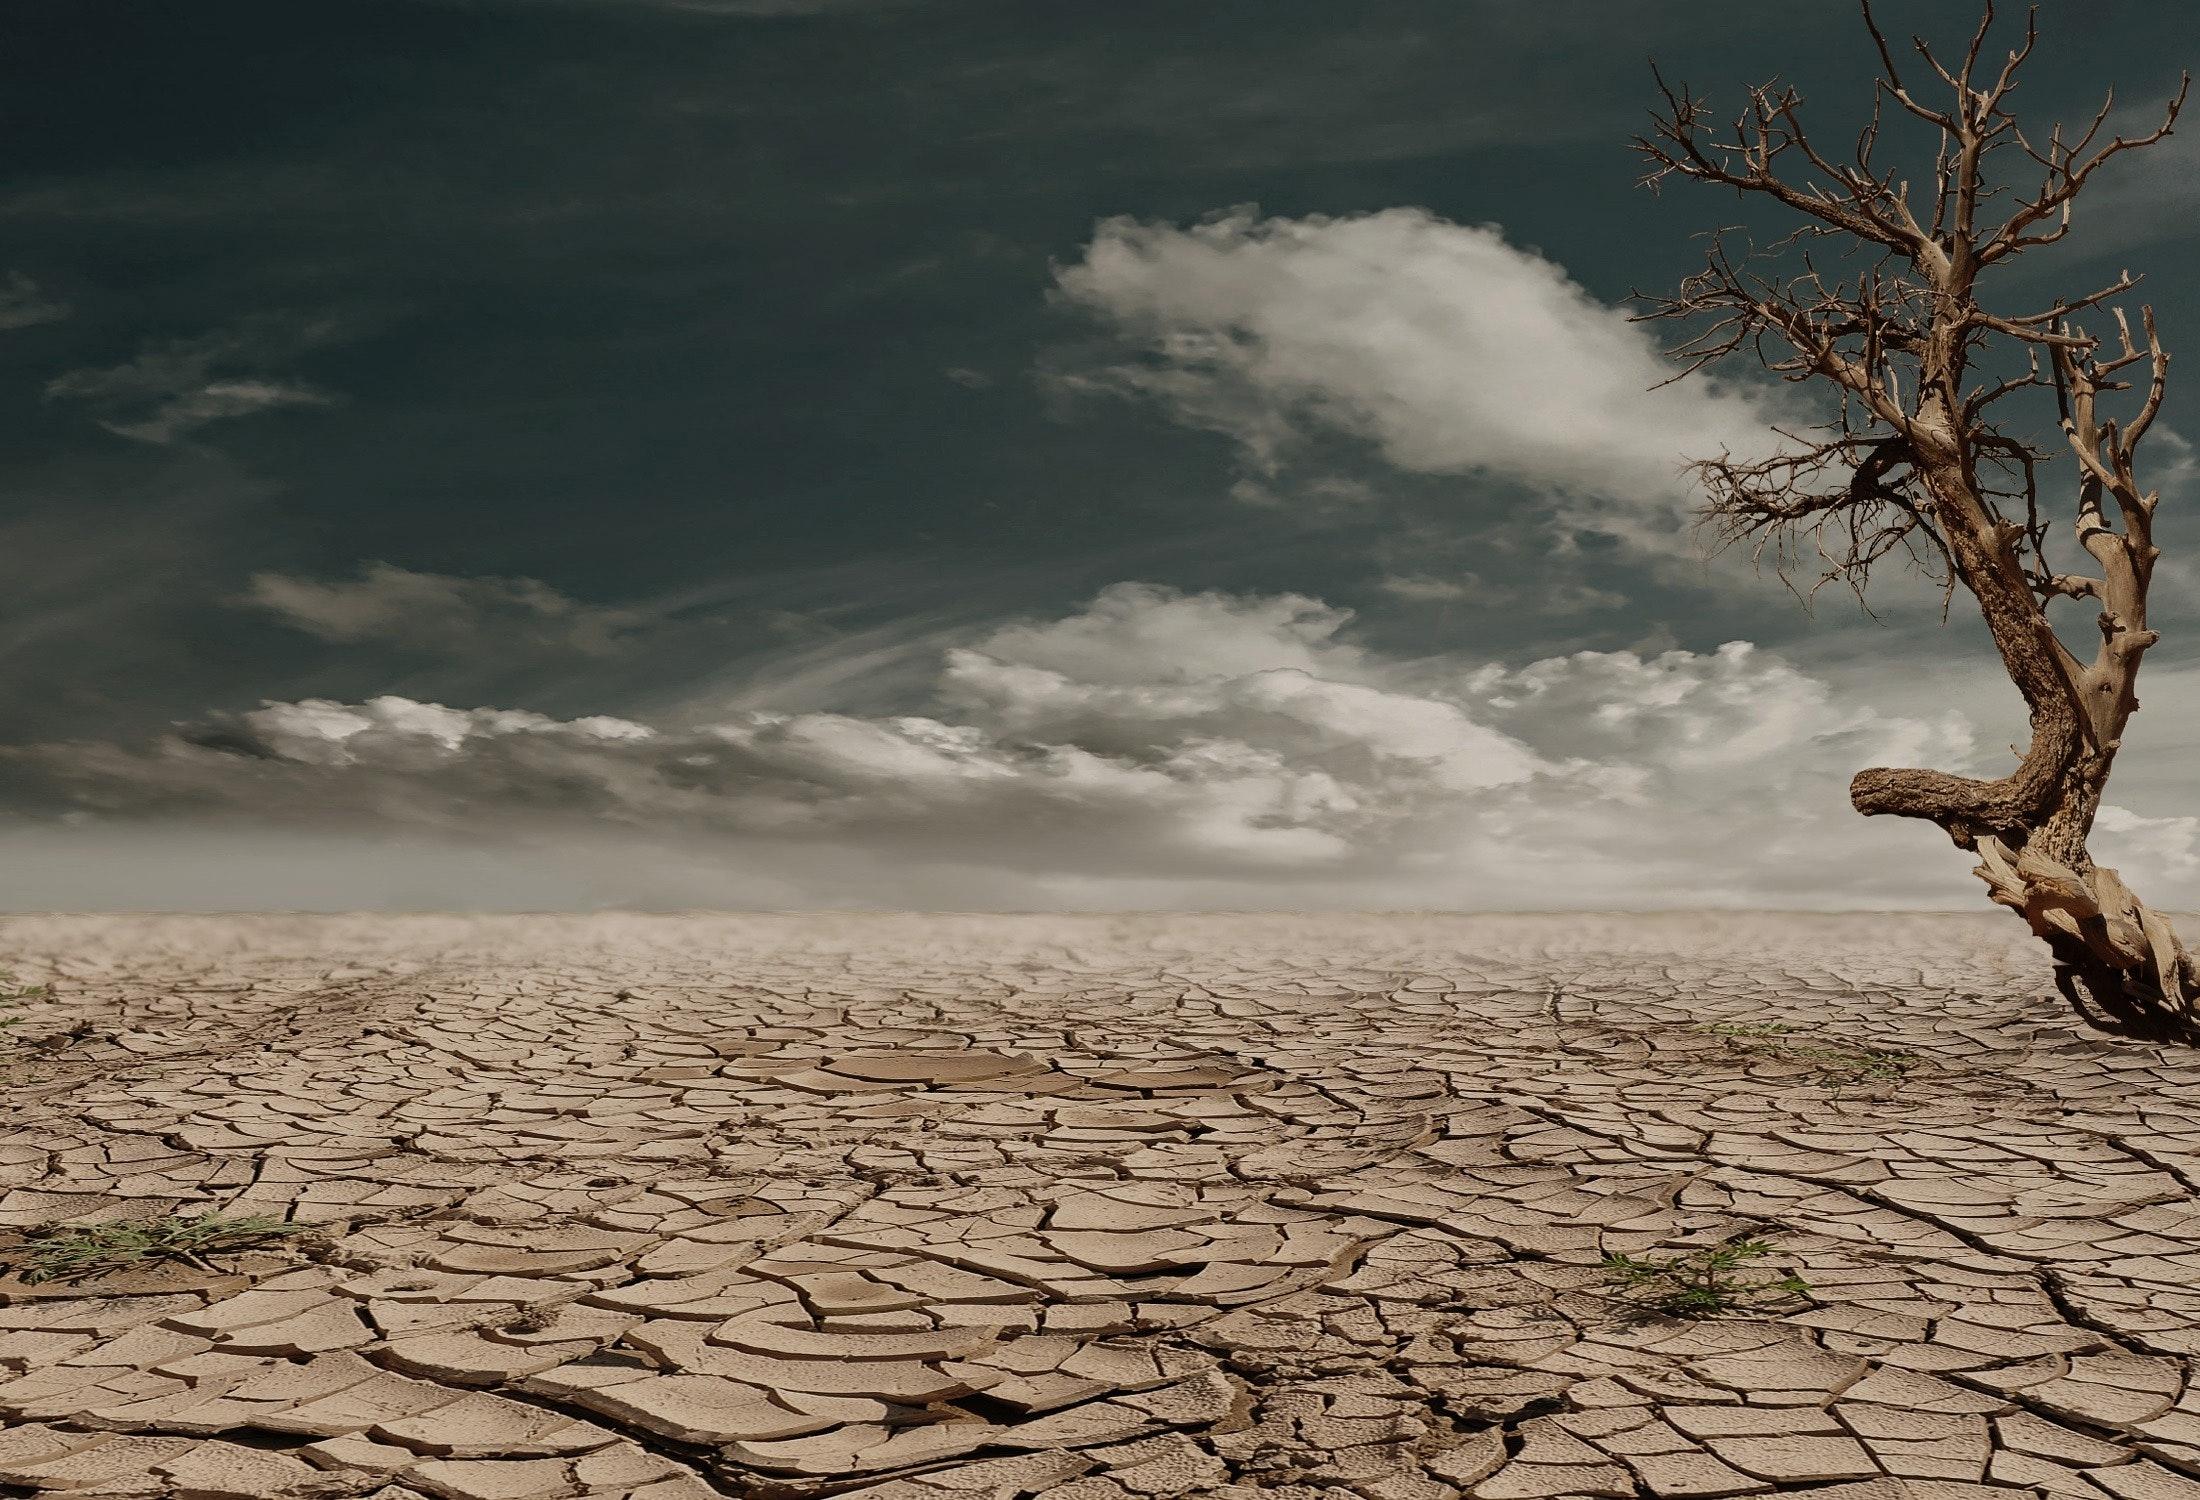 arid-climate-change-clouds-60013 (1).jpg